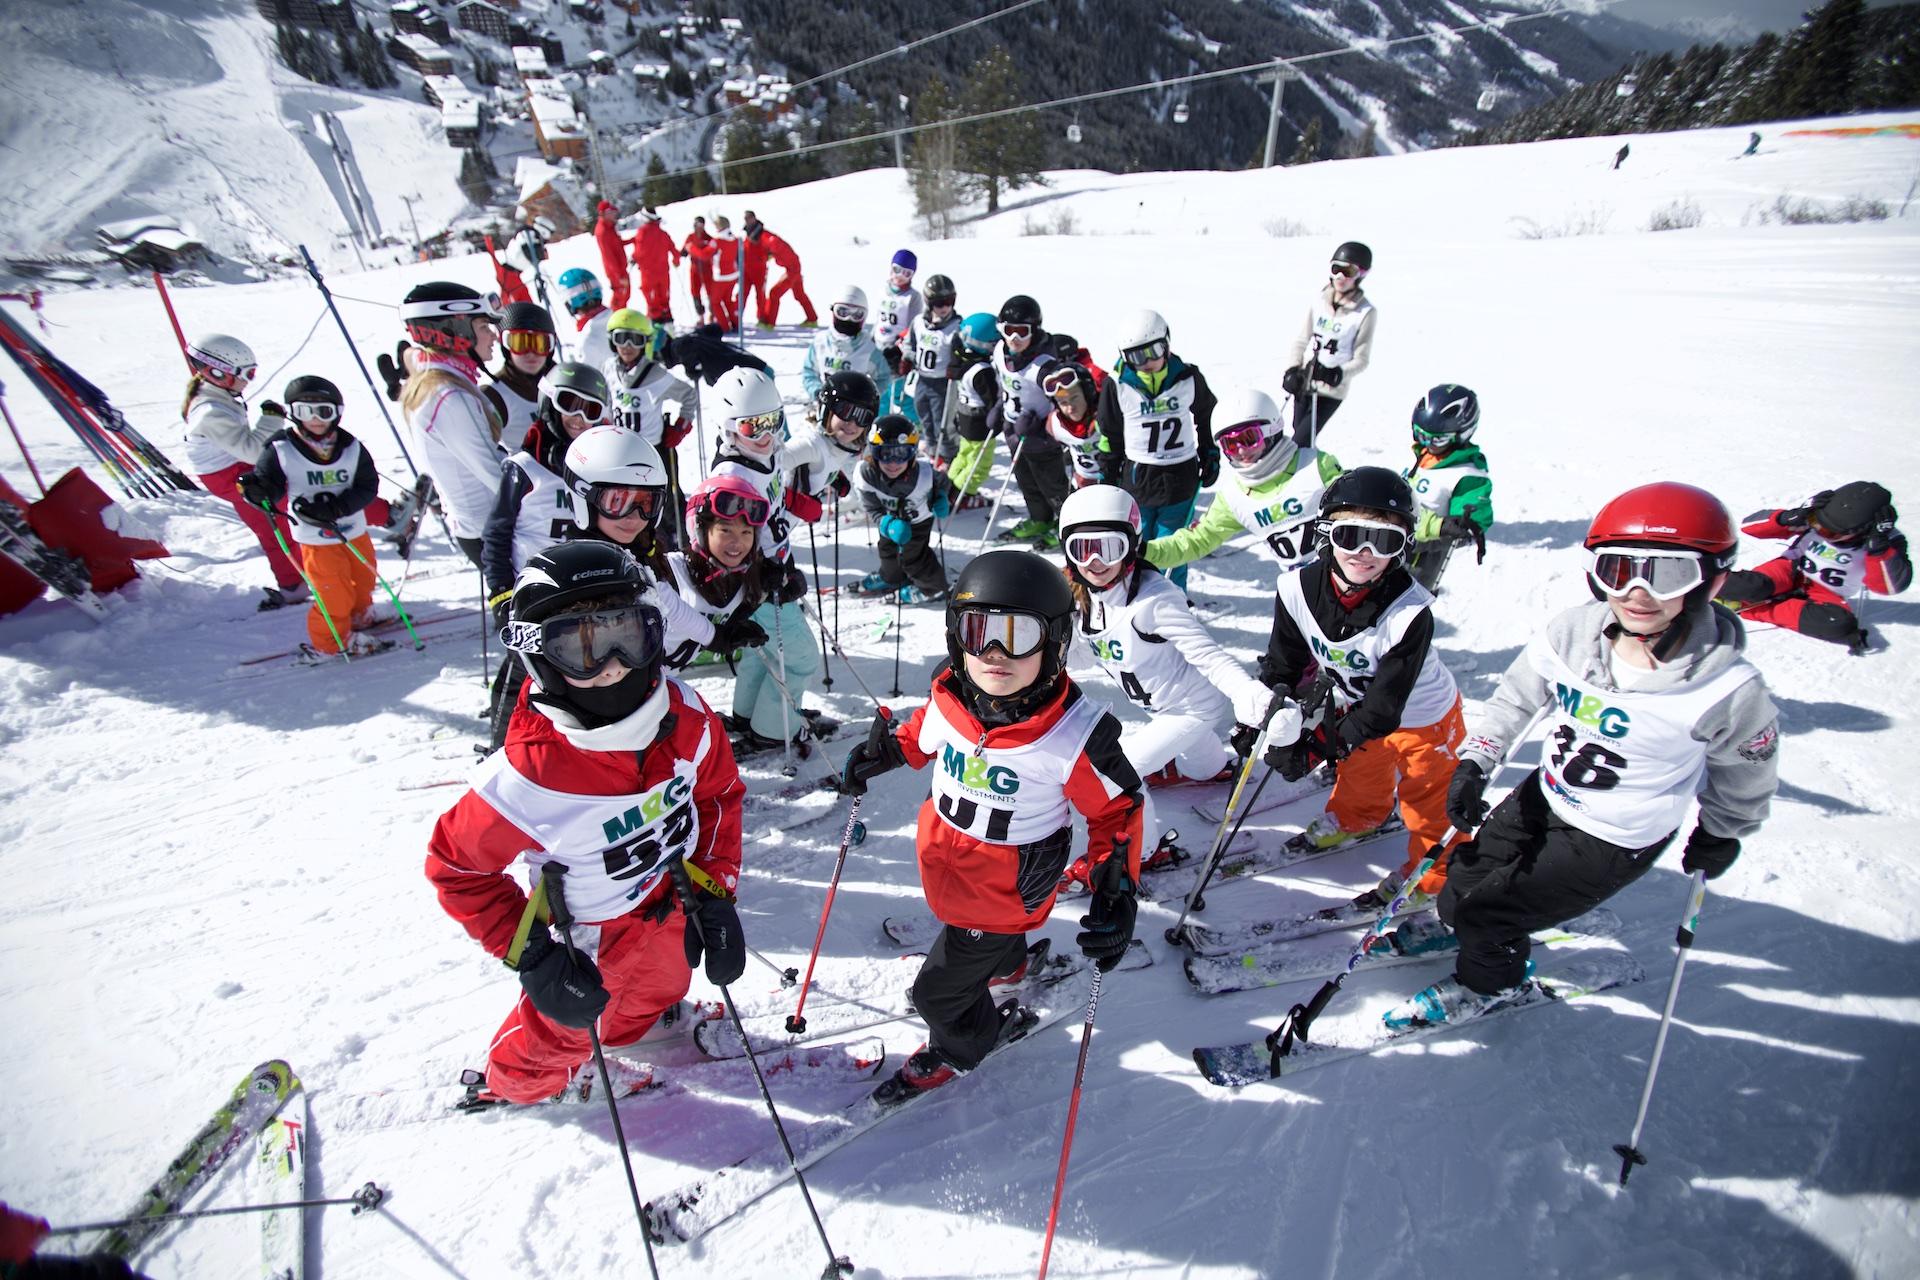 M&G Ski School Slalom Competition